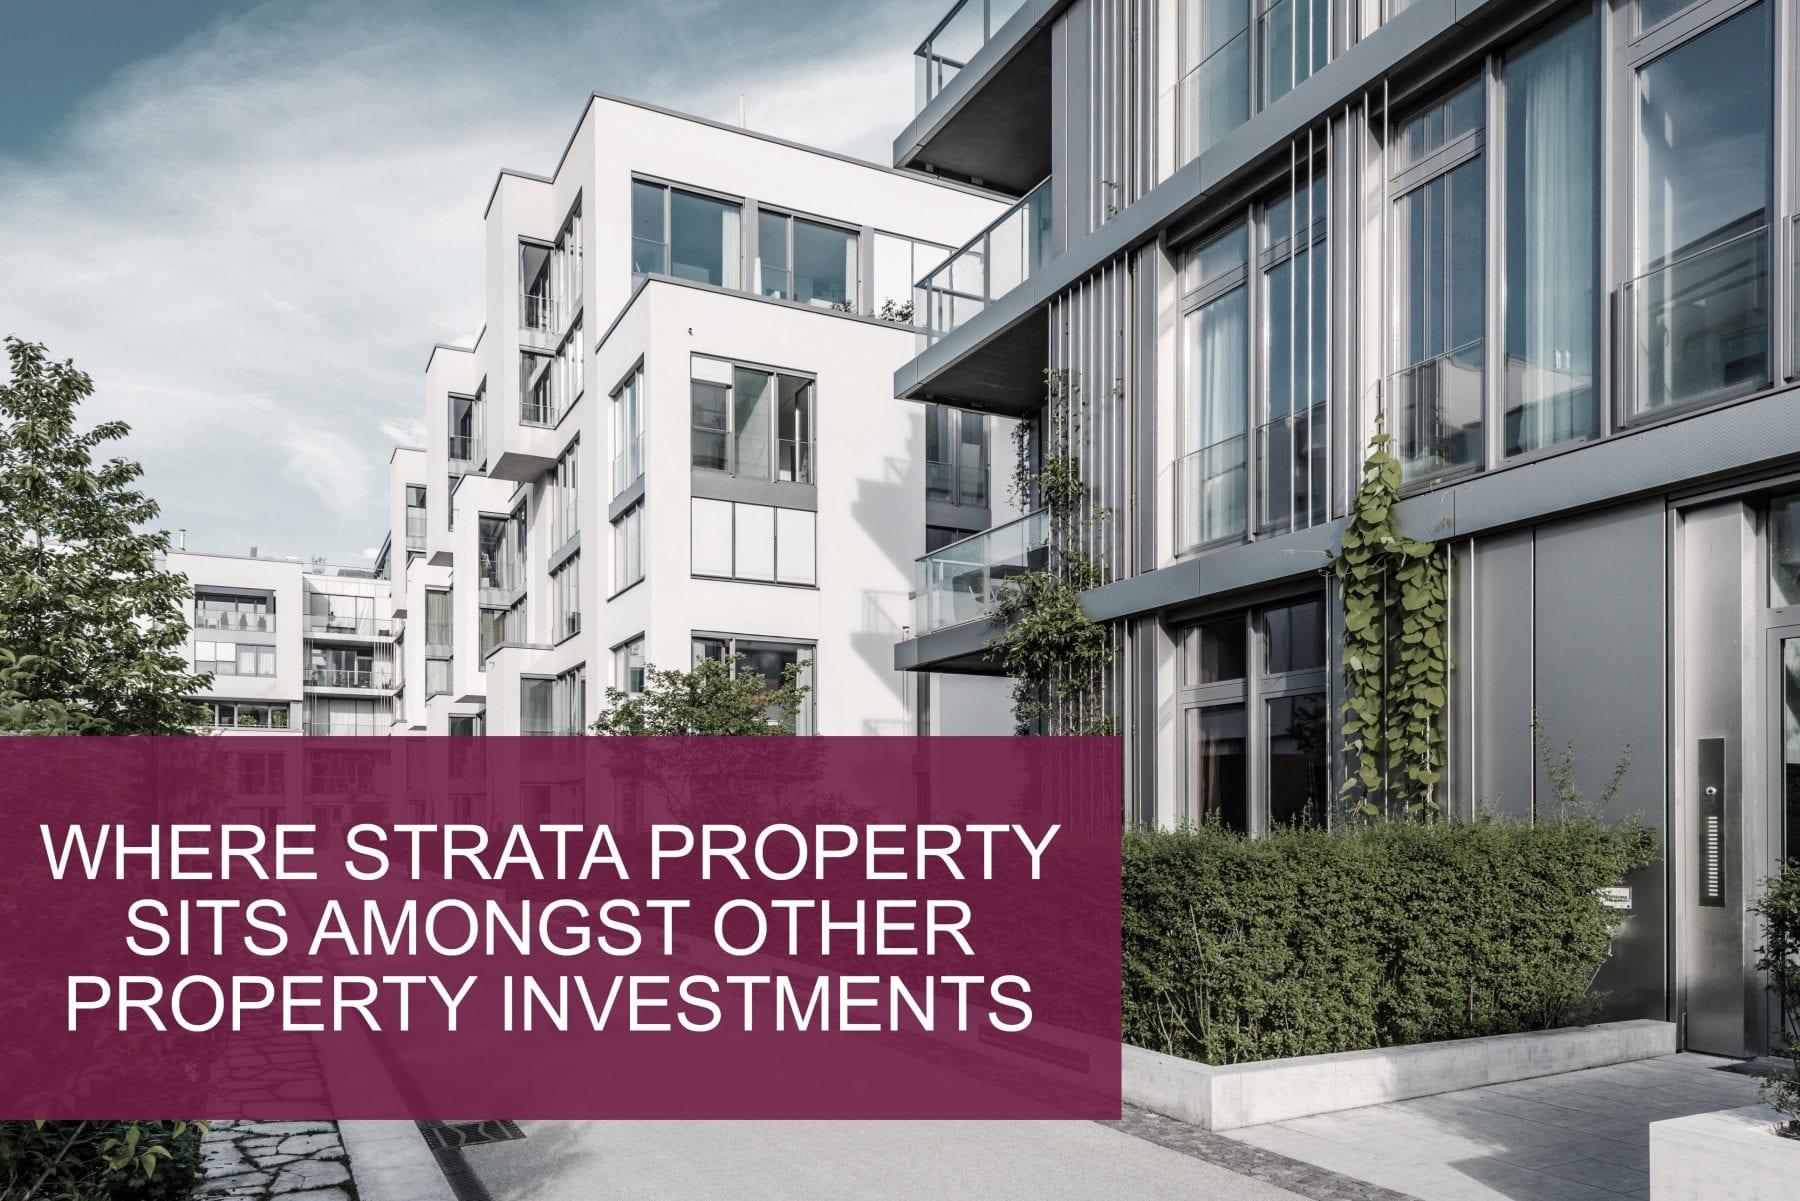 Strata property vs other property investments